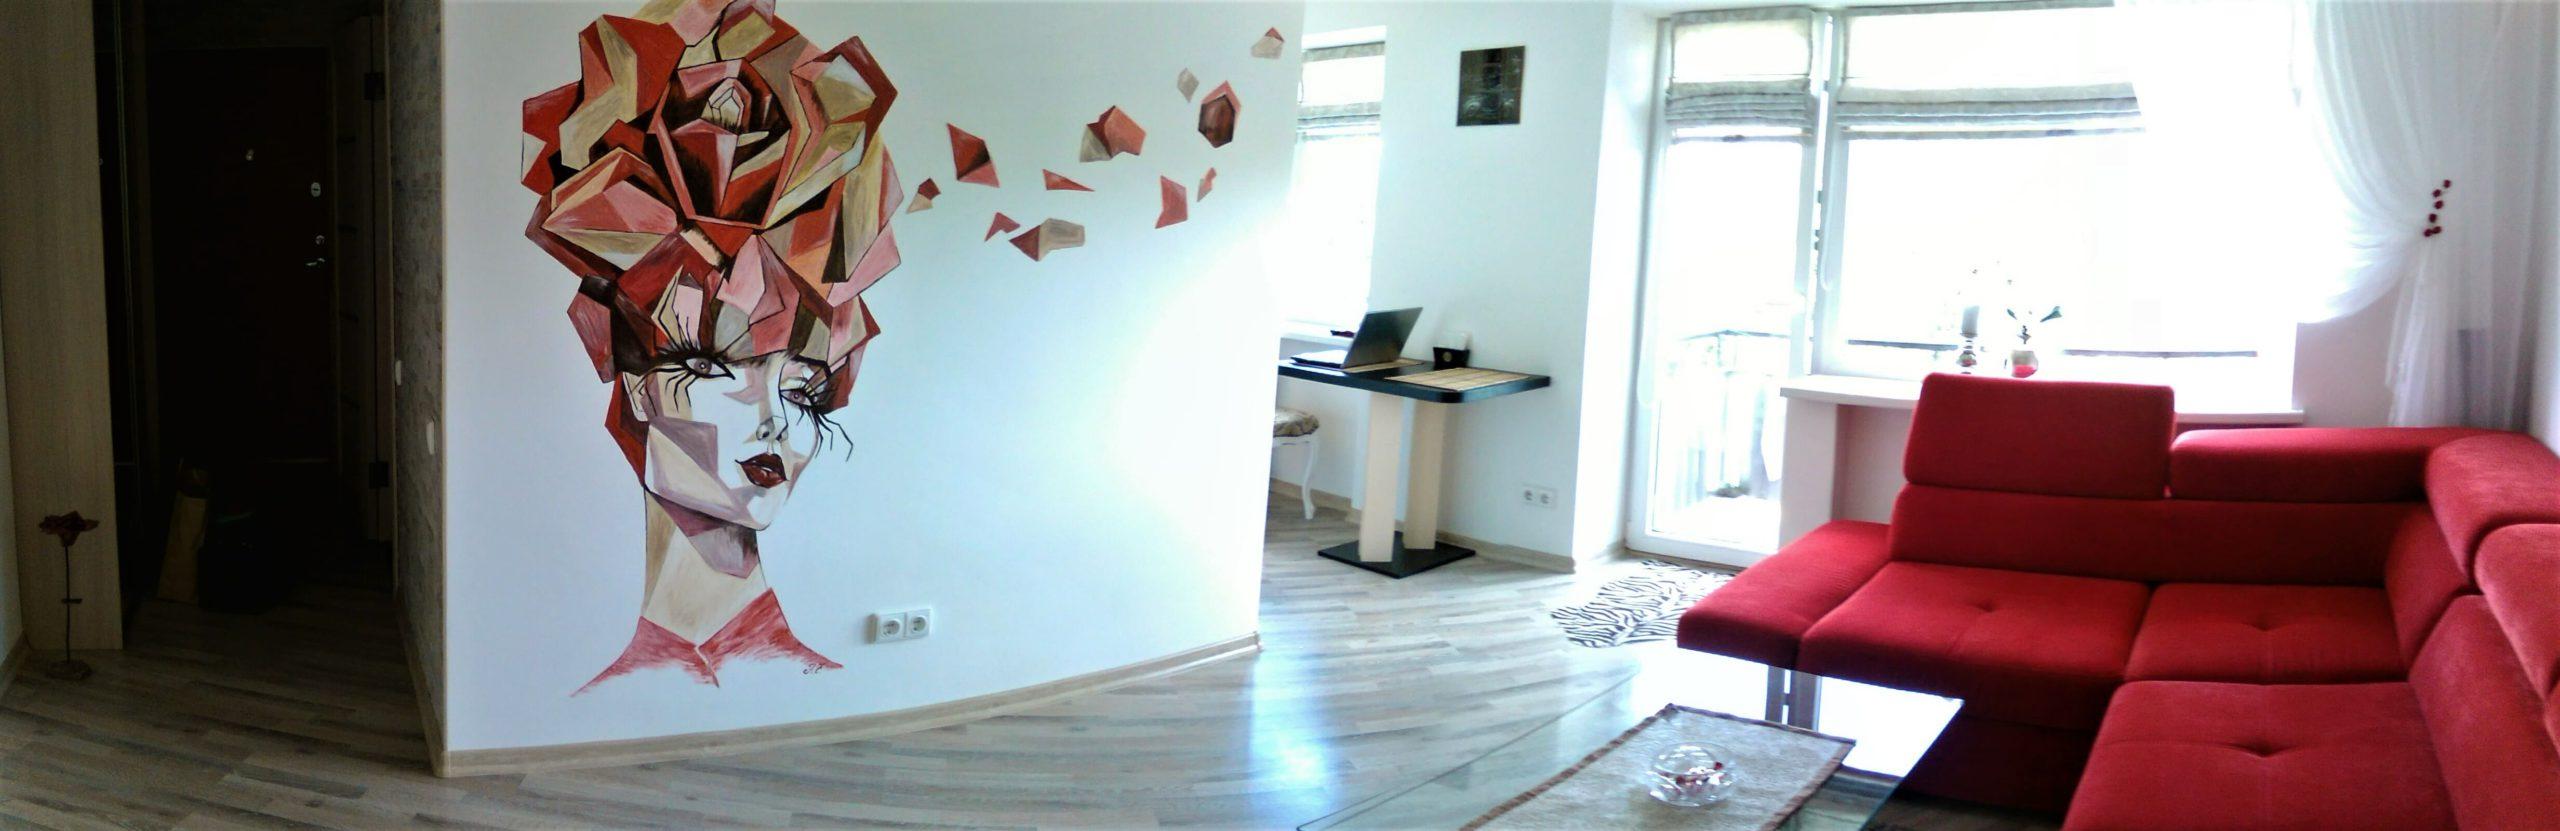 menine-kuryba-sienu-dekoravimas-ivairus-interjerai (6)